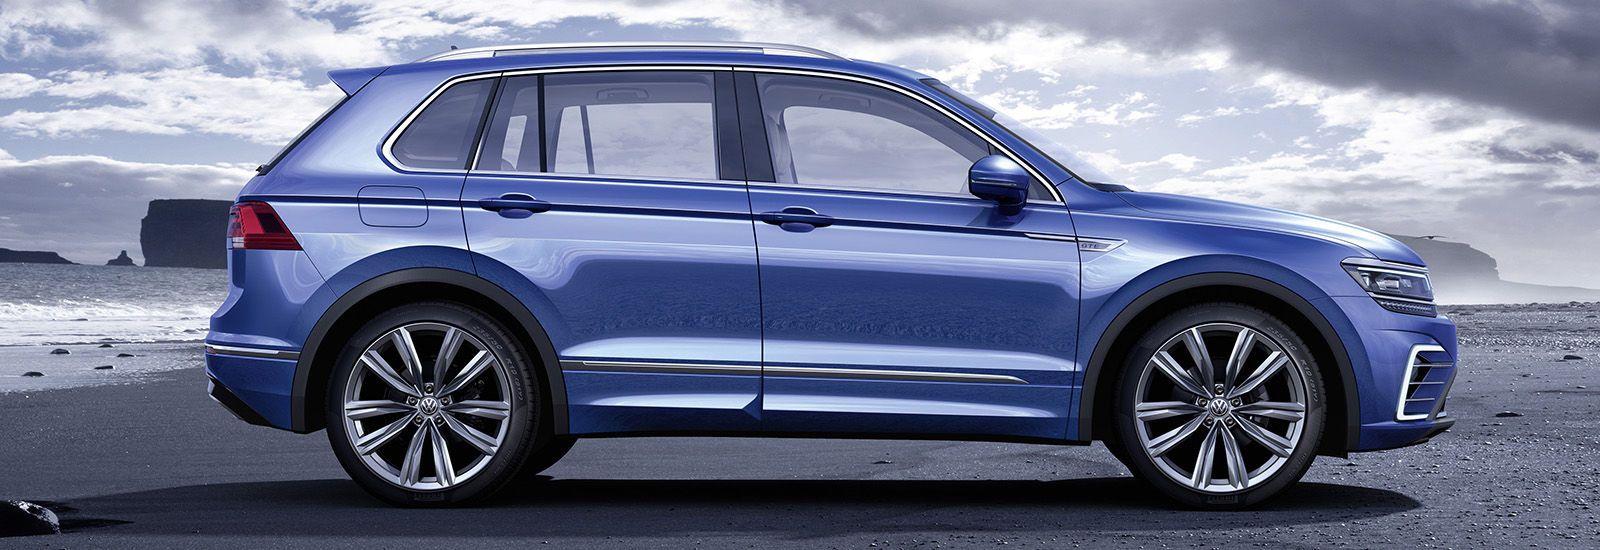 Skoda Kodiak 7 Seater Suv Price Specs Release Date Carwow Biler